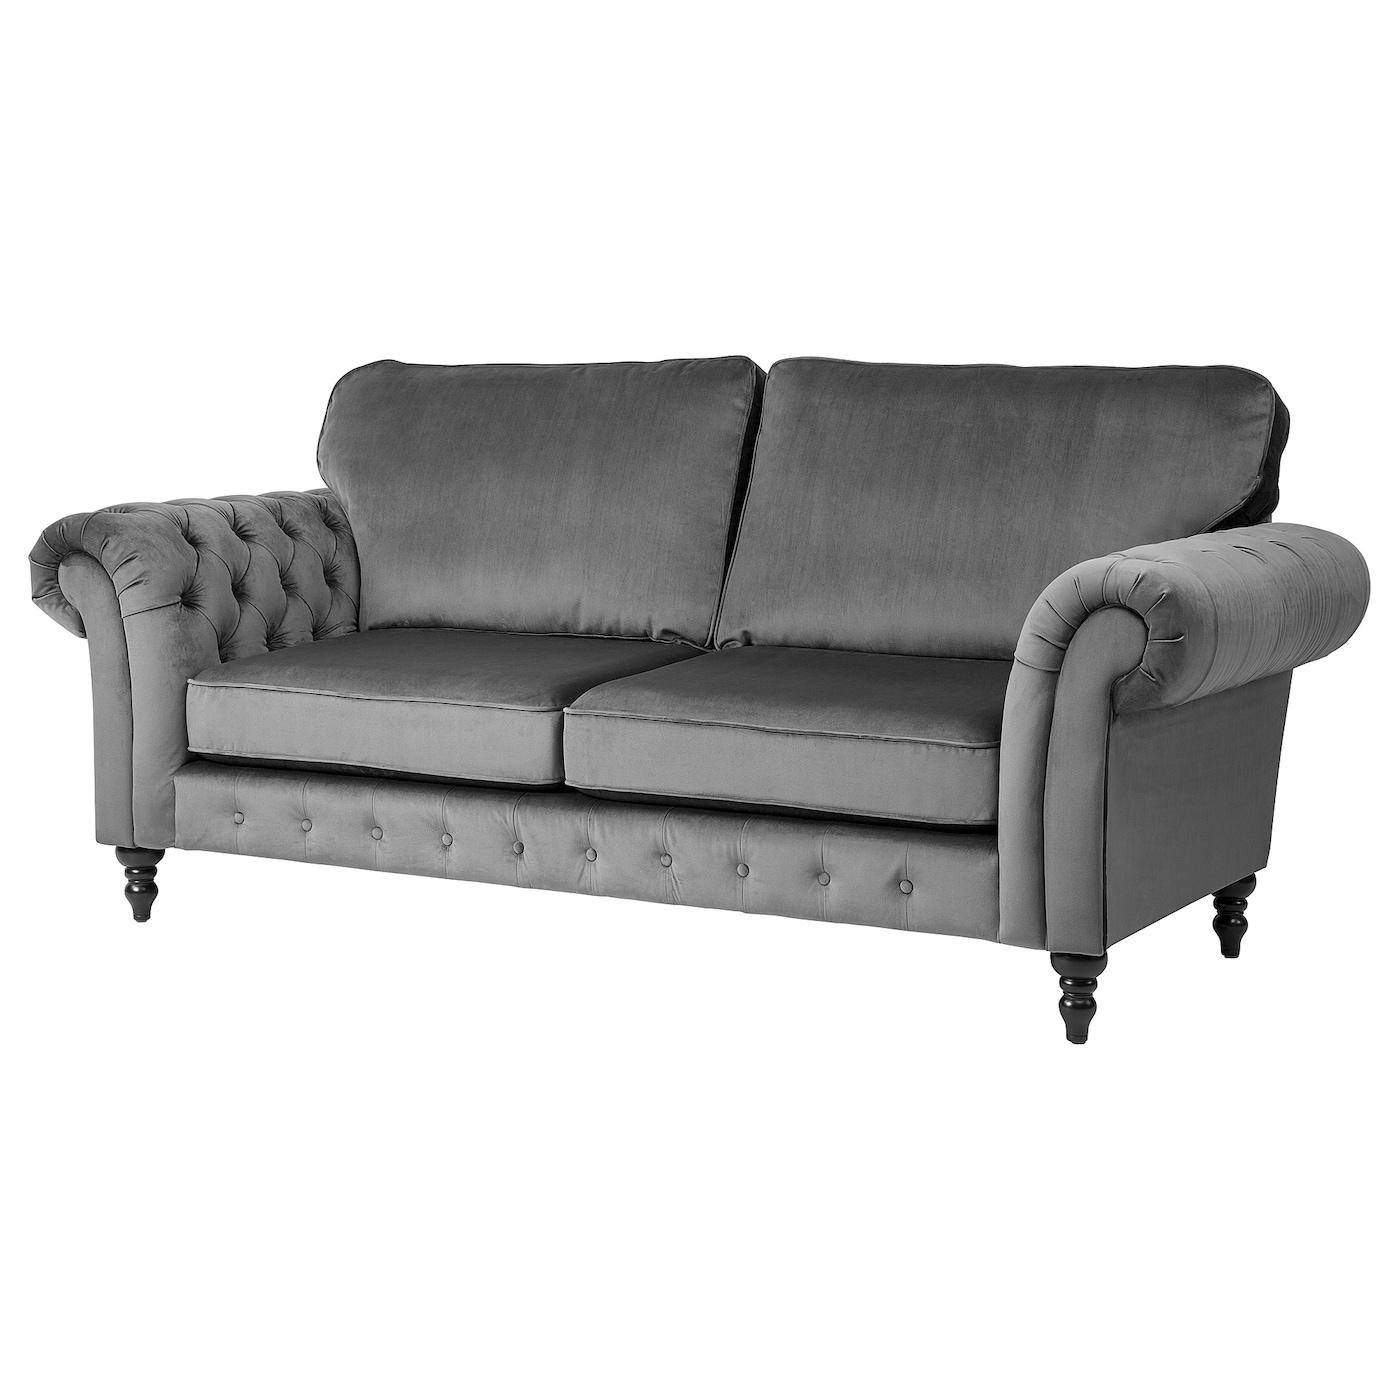 Ikea Grevie 3 Seat Sofa